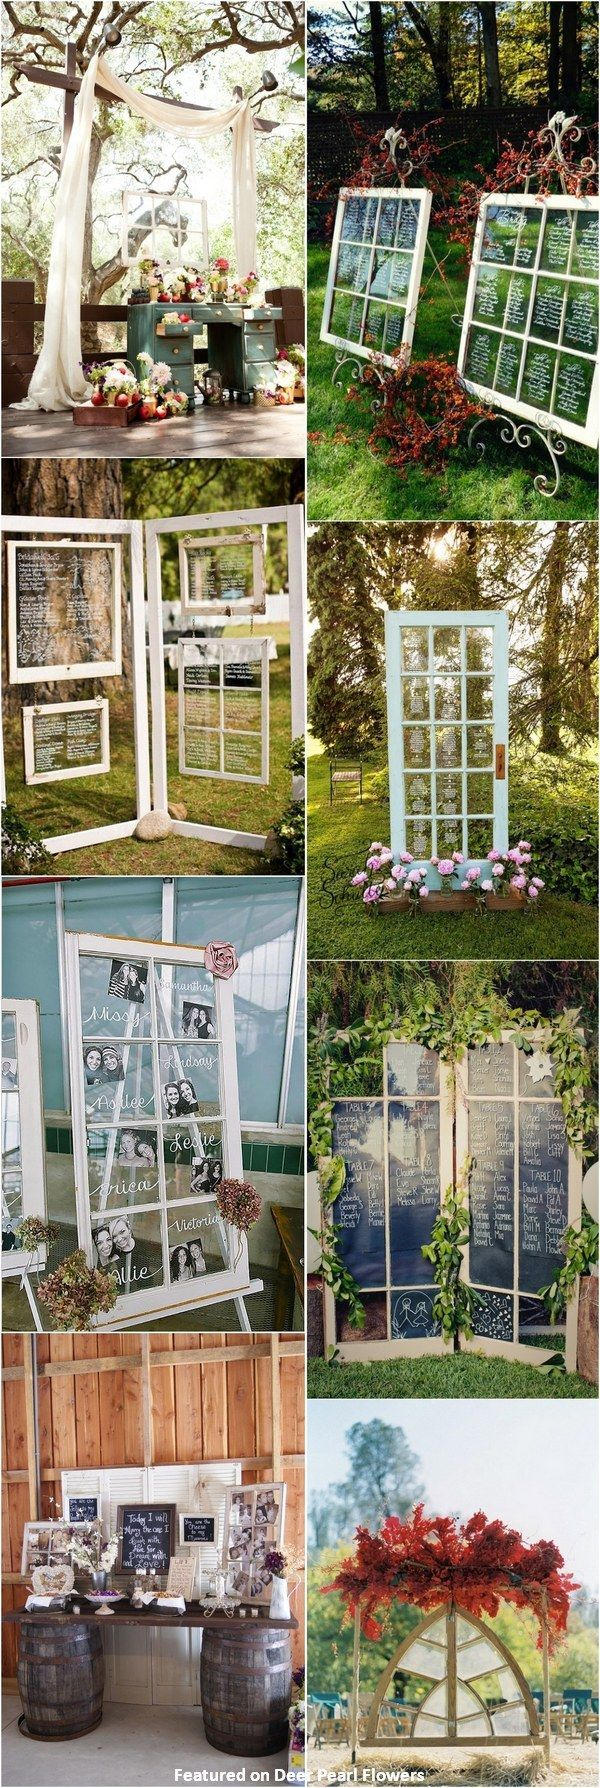 Wedding decoration ideas rustic  vintage rustic old window wedding decor ideas